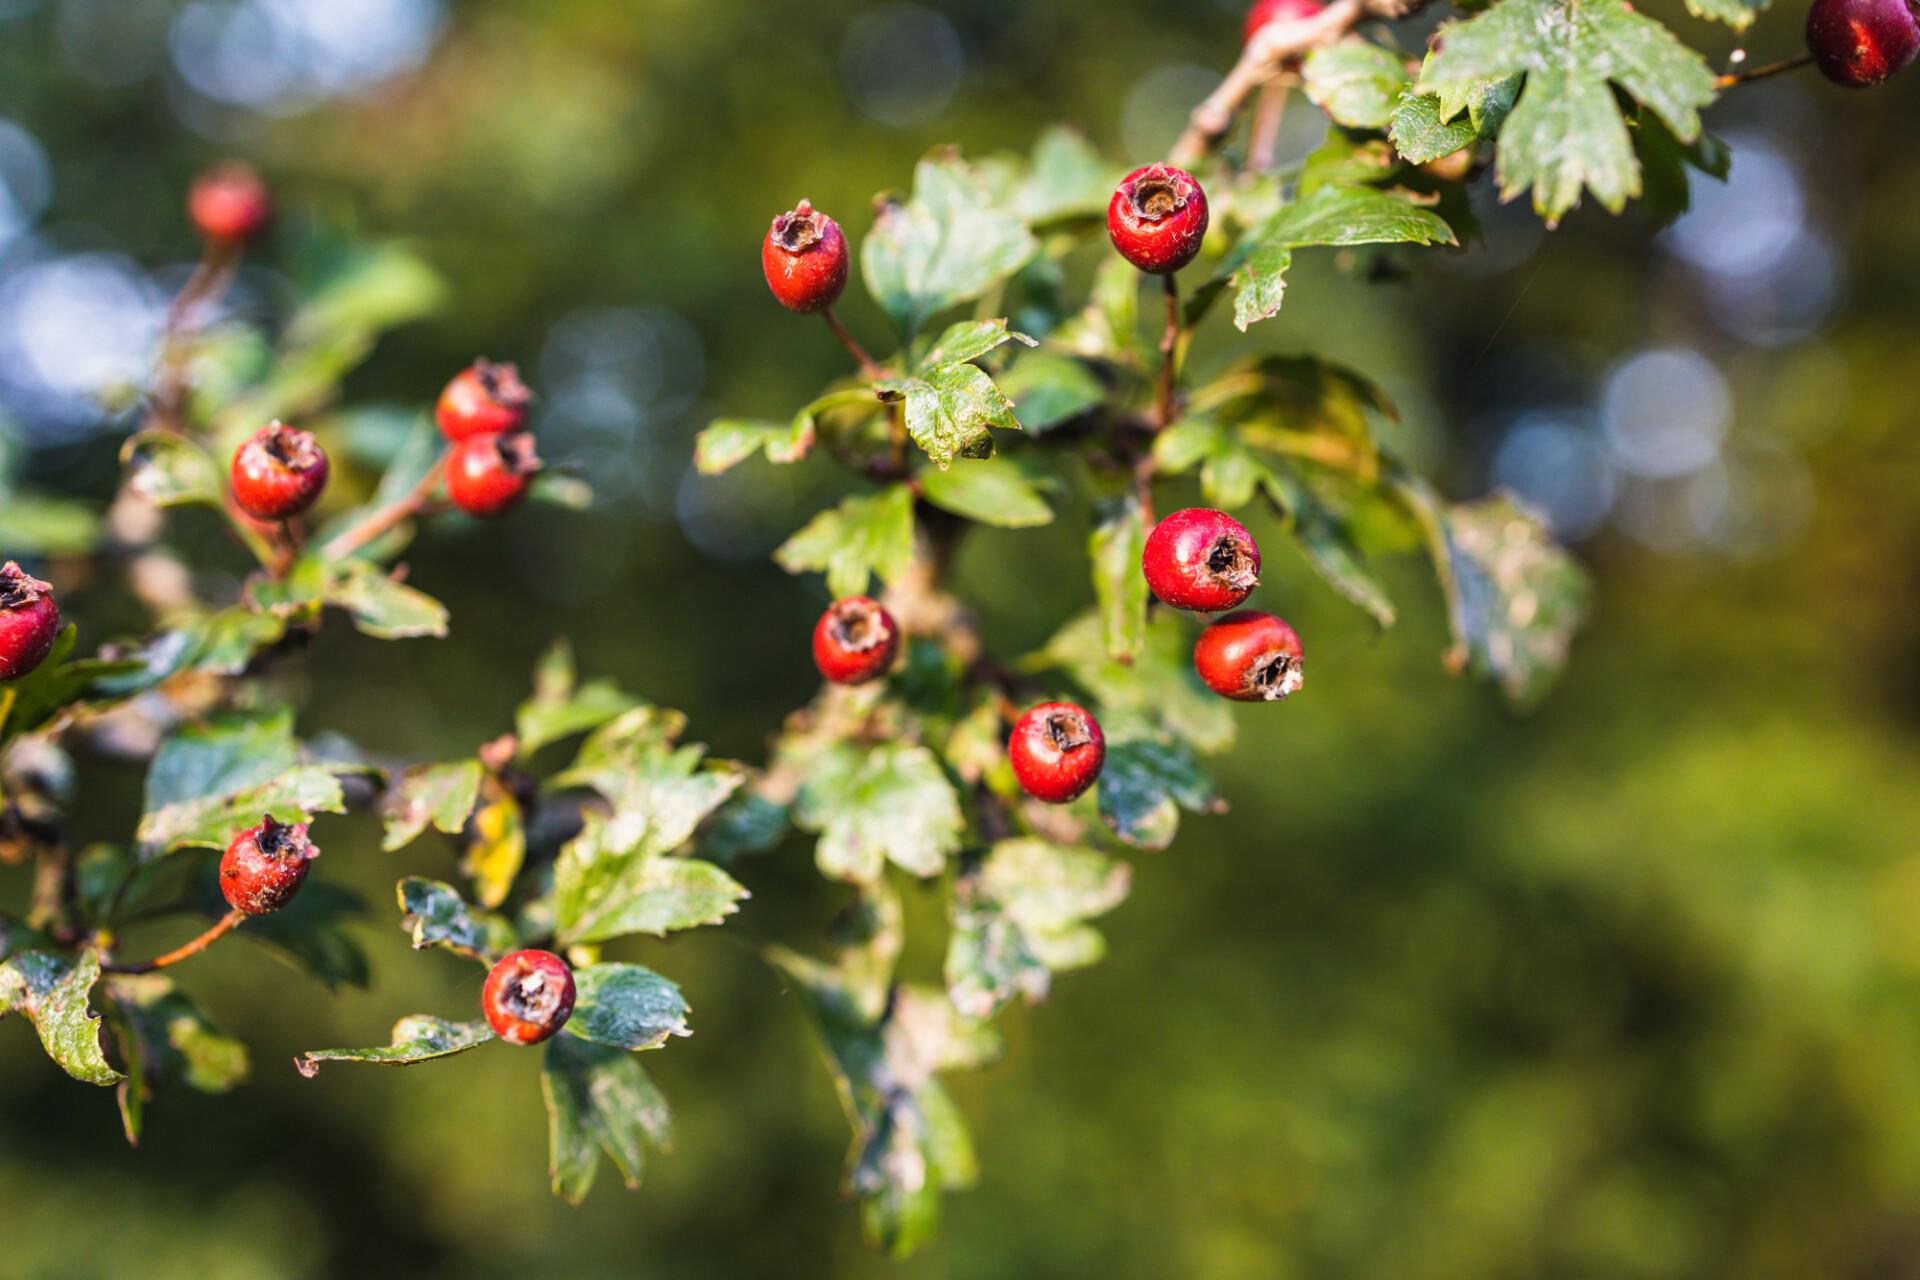 Hawthorn Tree branch